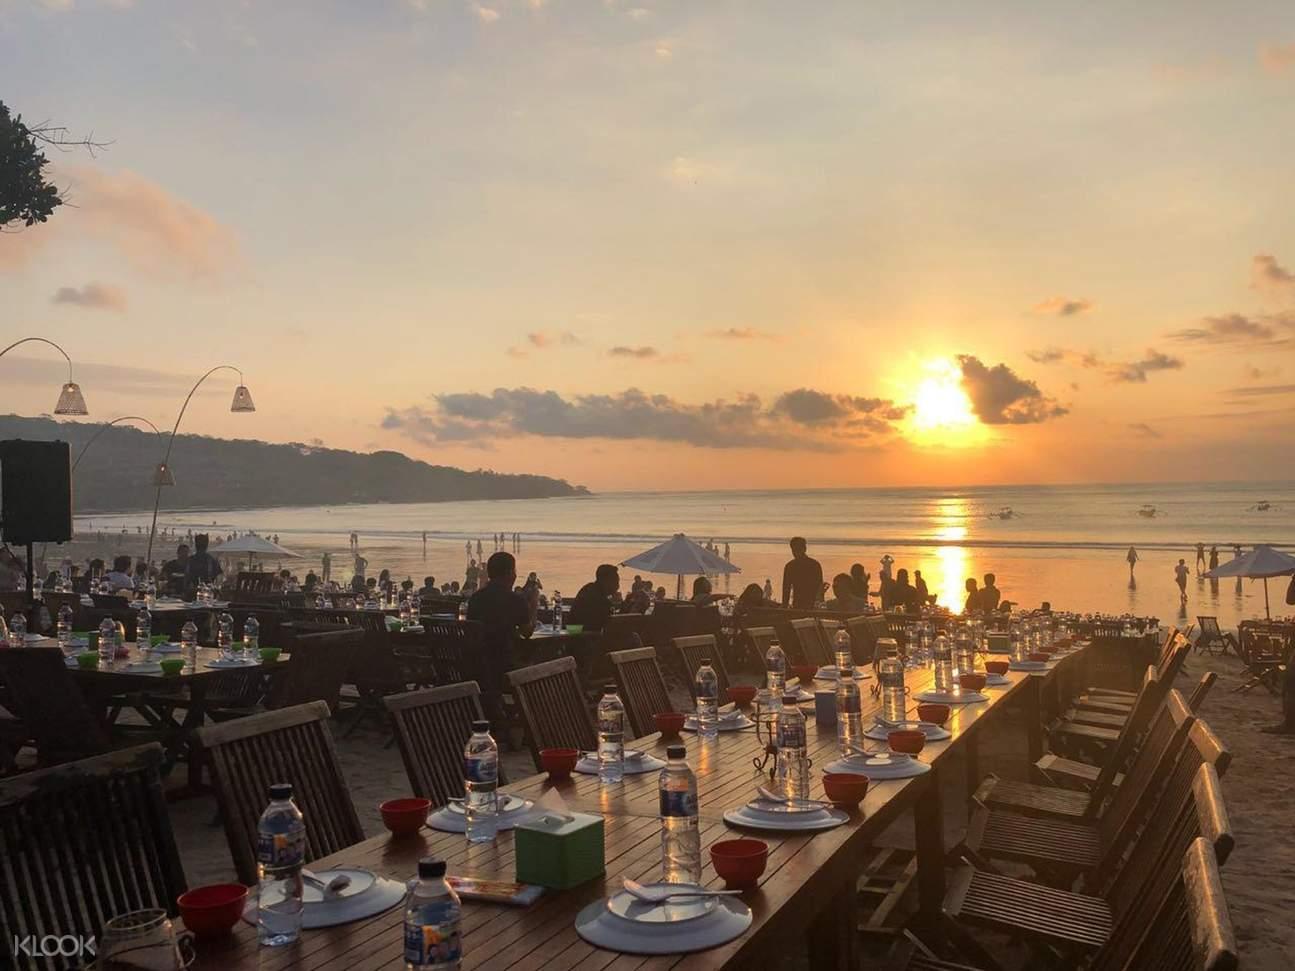 sunset di bali serta meja untuk bersantap